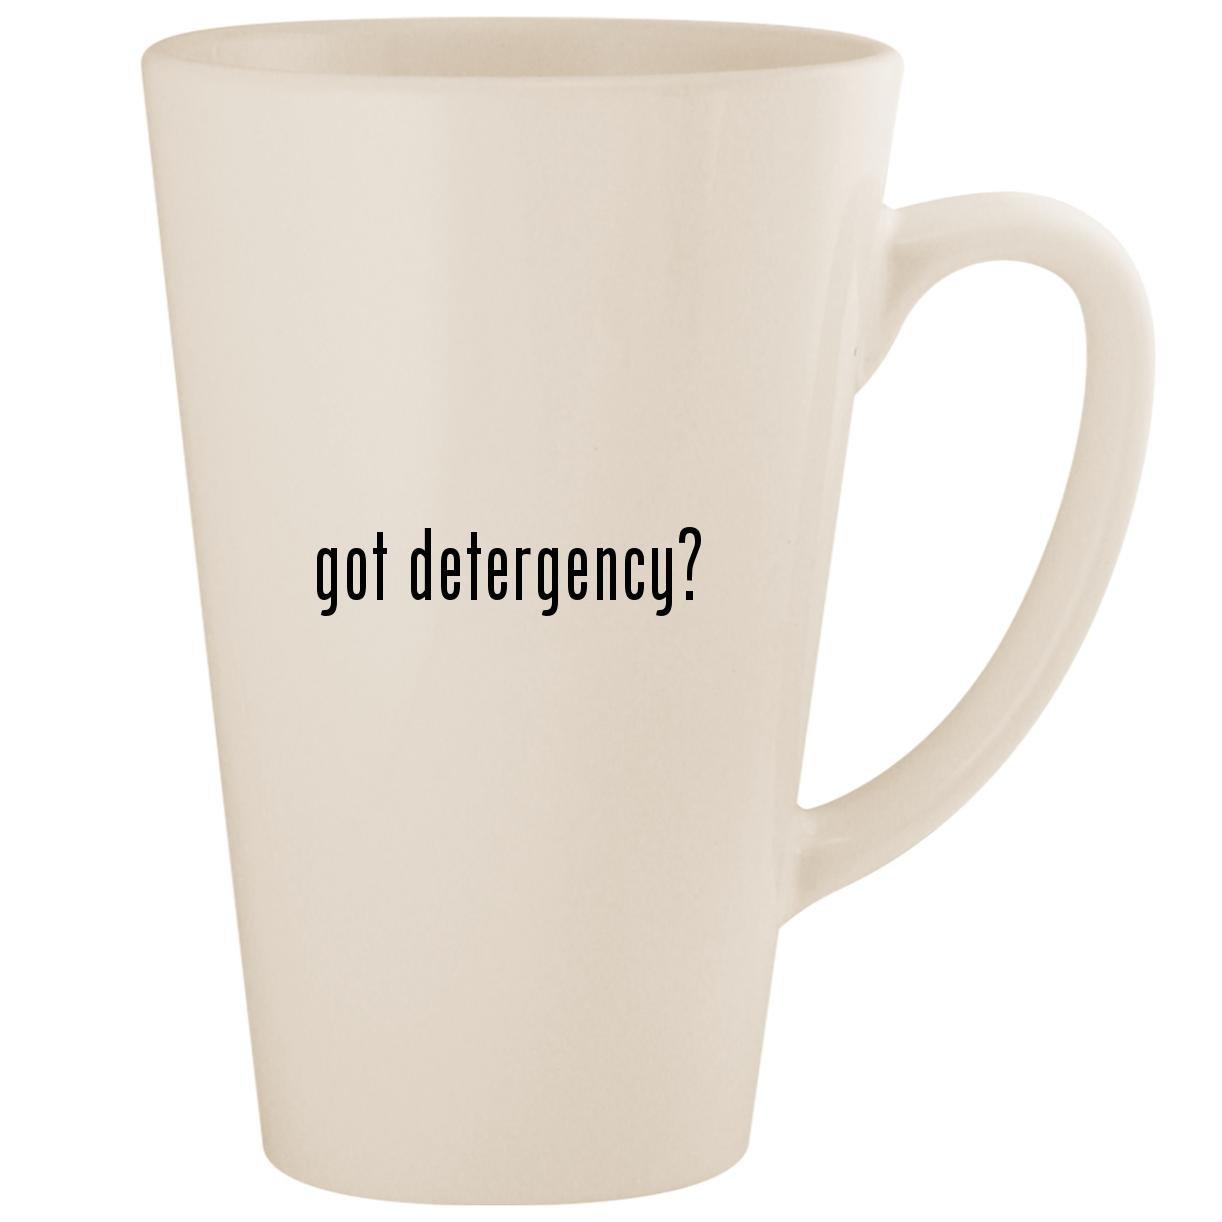 got detergency? - White 17oz Ceramic Latte Mug Cup